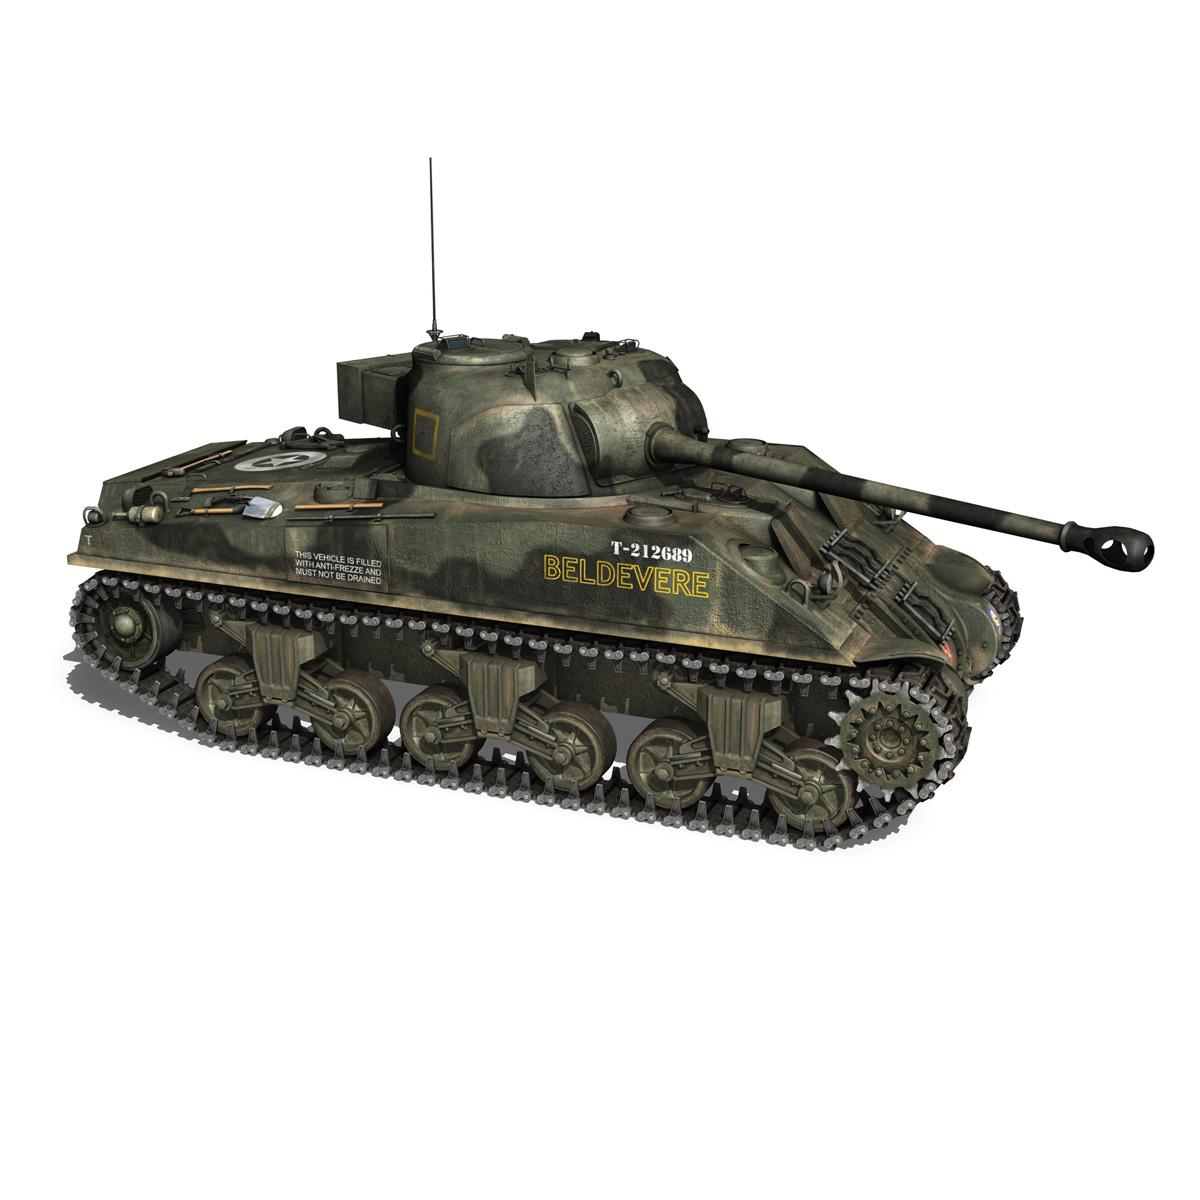 Sherman MK VC Firefly - Beldevere 3d model  266017